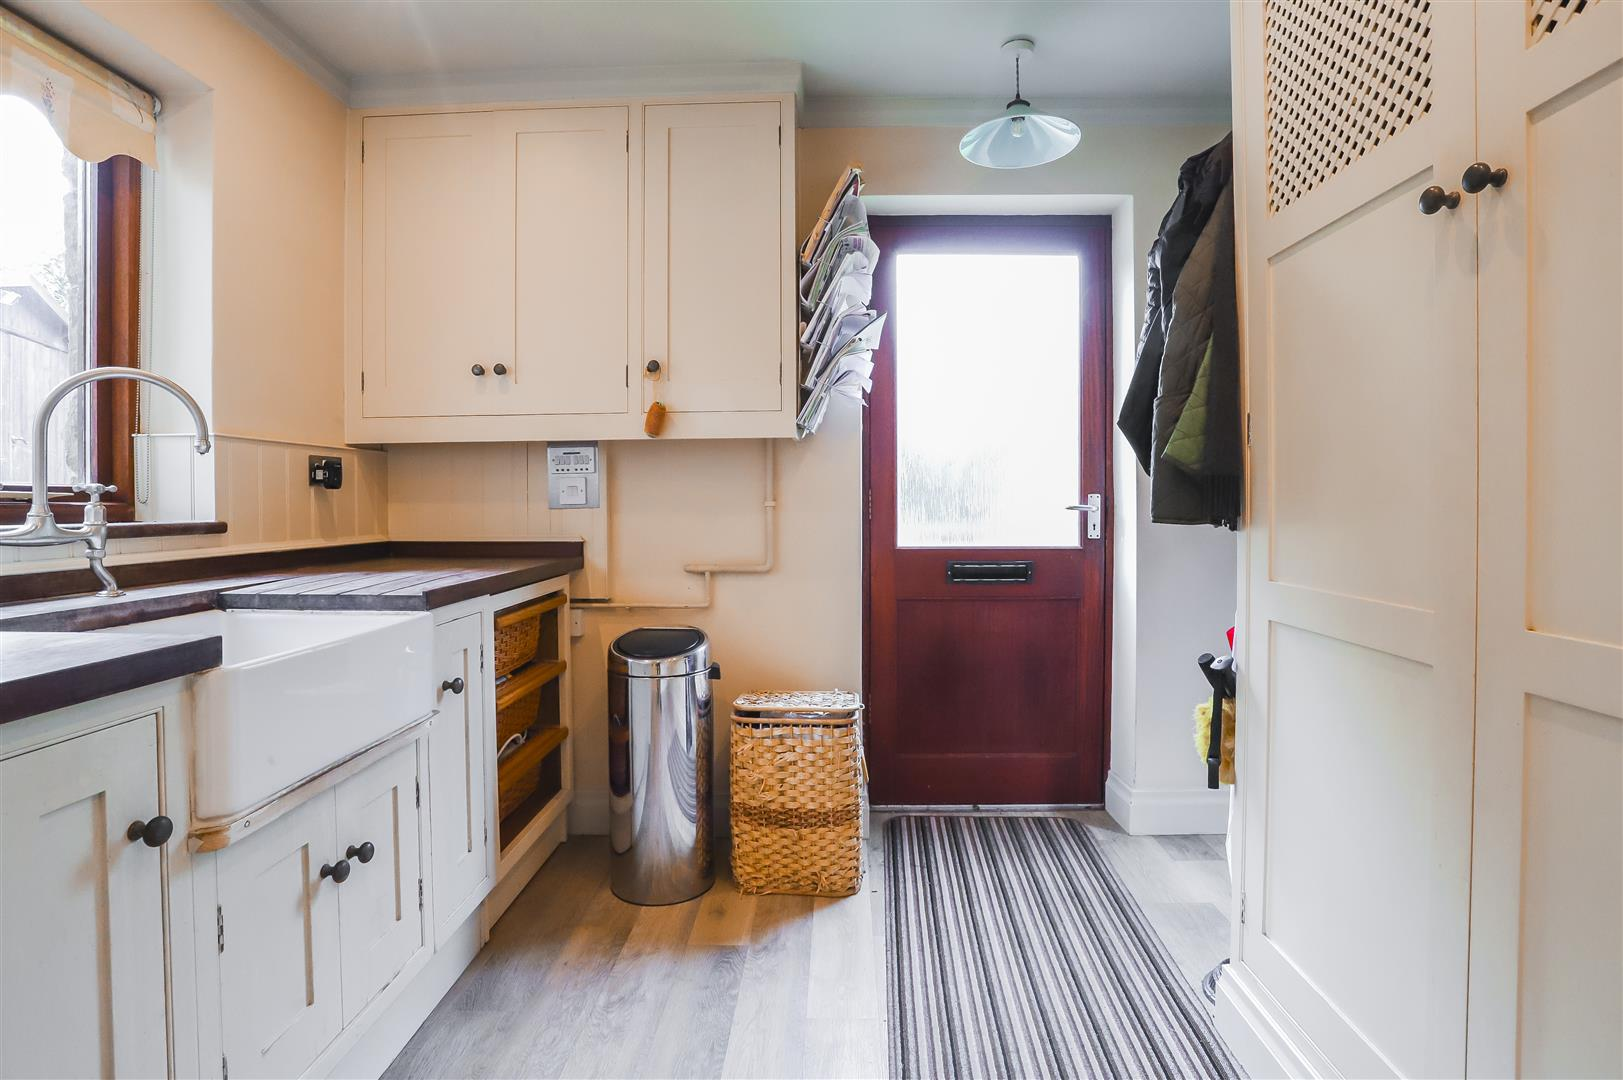 4 Bedroom Detached House For Sale - Image 34